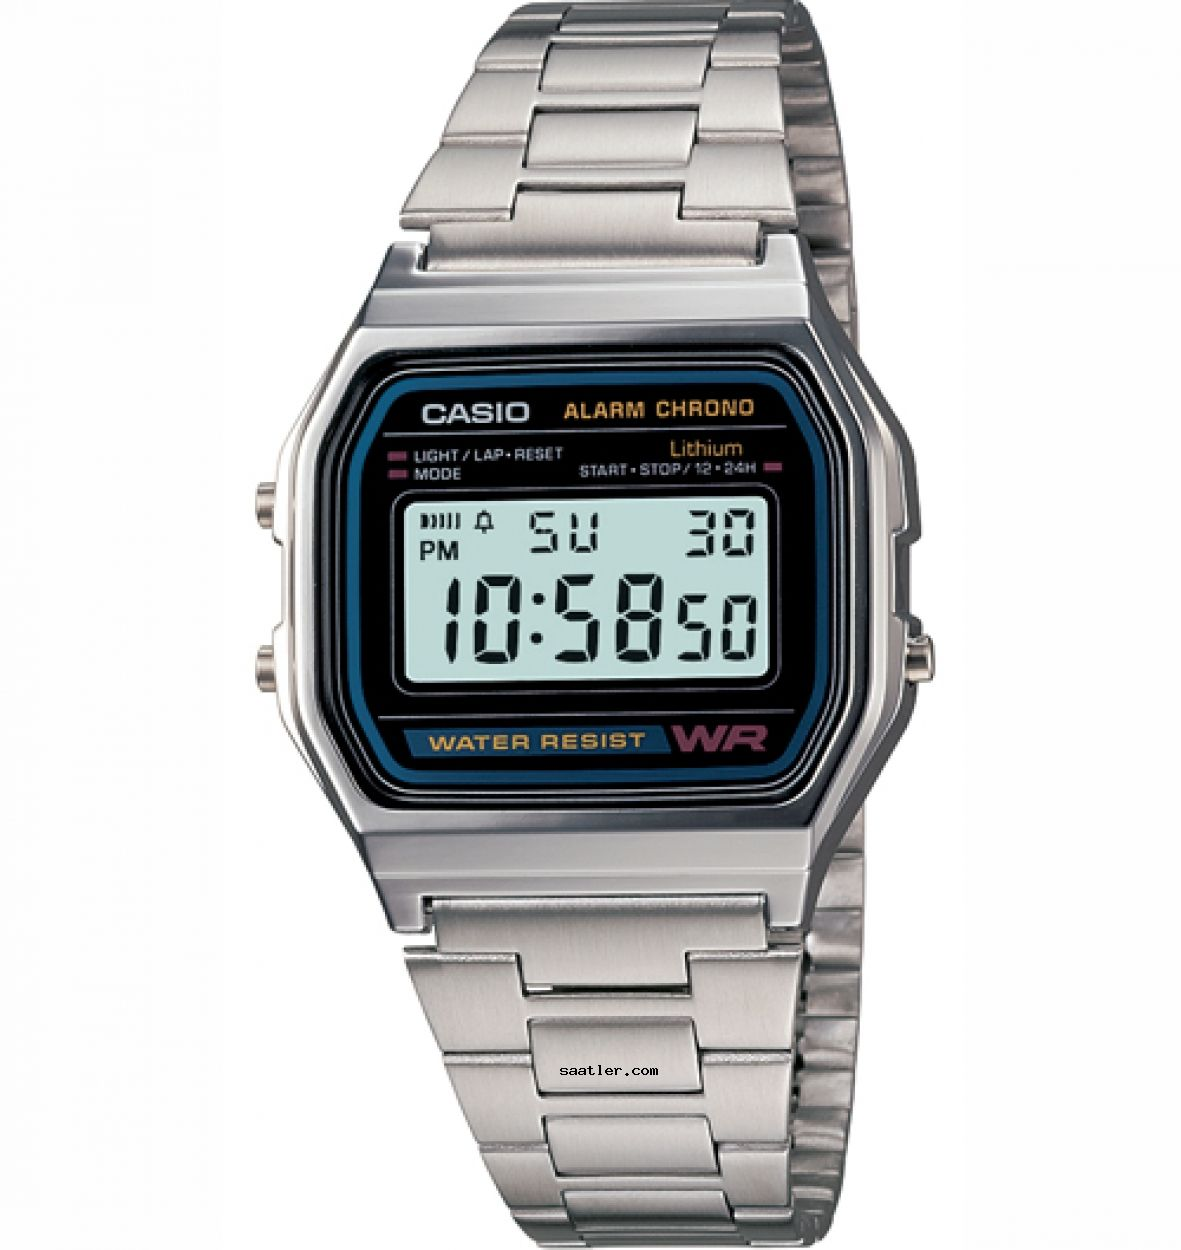 Casio A158wa 1df Kol Saati Erkek Kol Saatleri Dijital Saat Retro